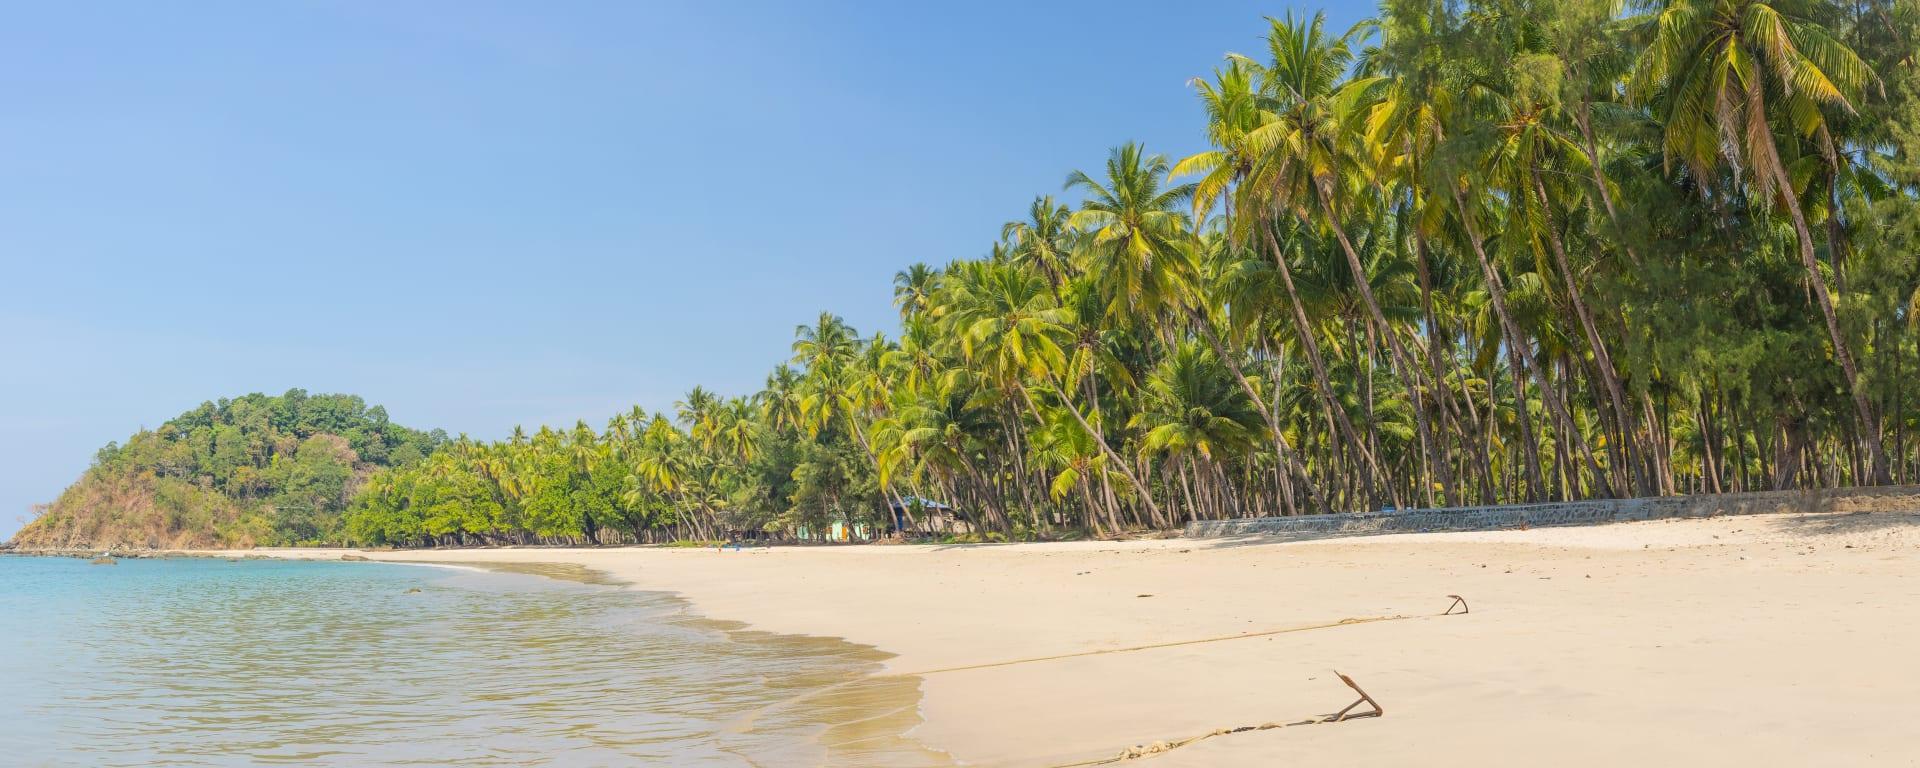 Myanmar entdecken mit Tischler Reisen: Myanmar Ngapali Beach